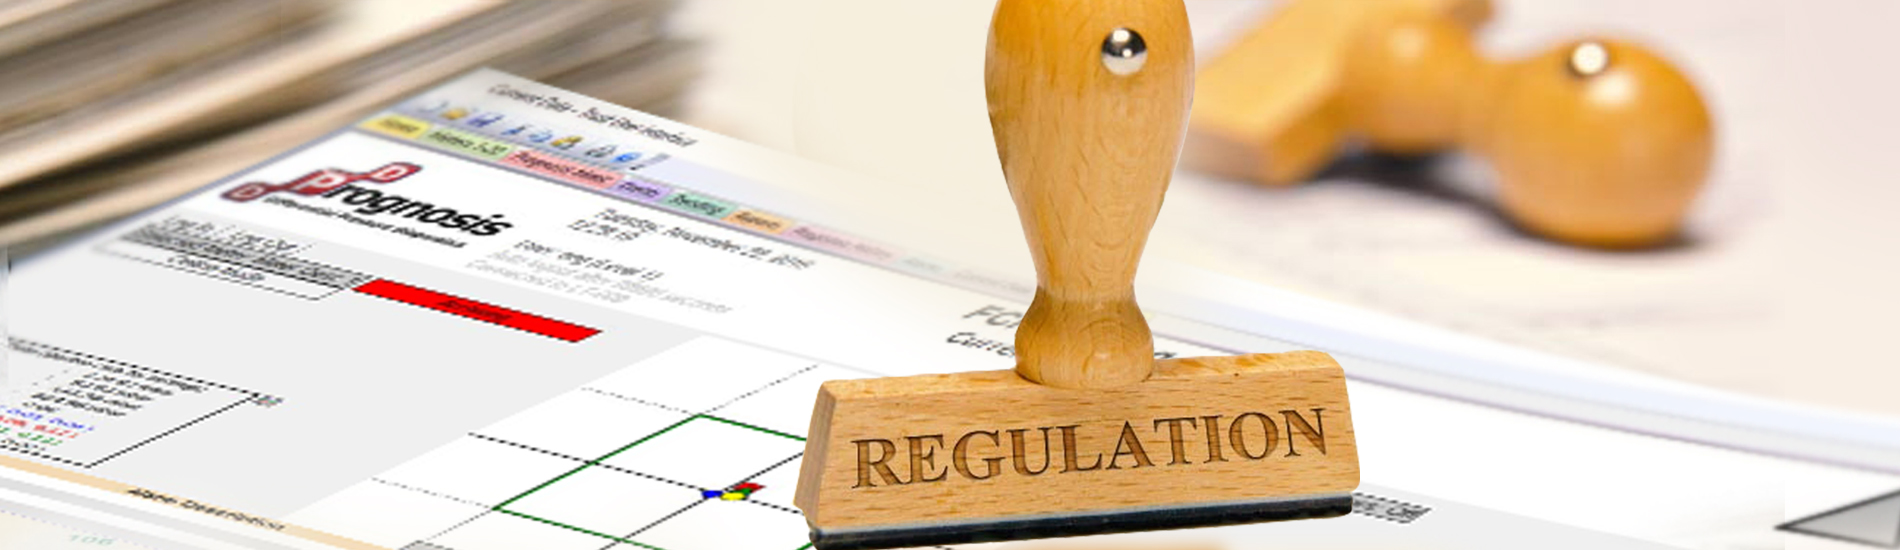 Regulatory Acceptance Banner